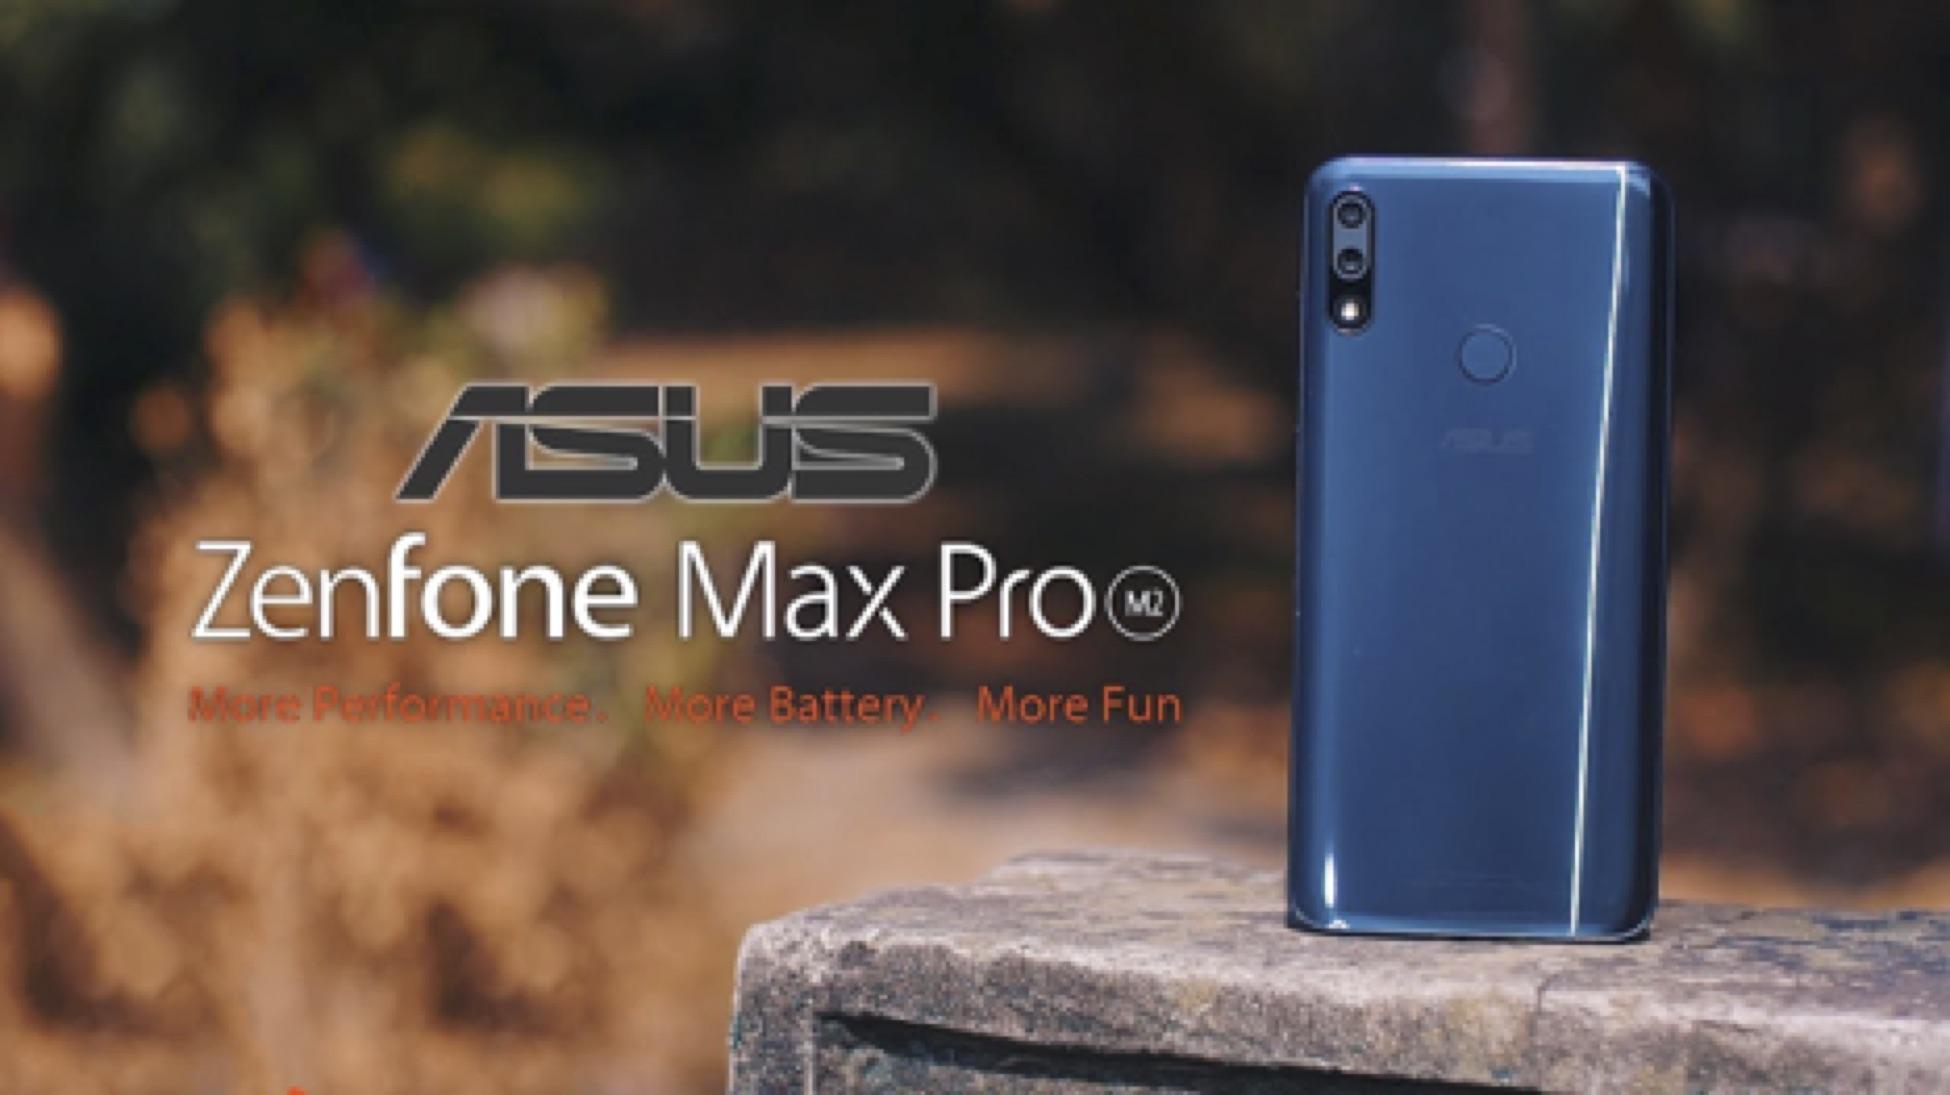 Asus Zenfone Max Pro M2 Singapore